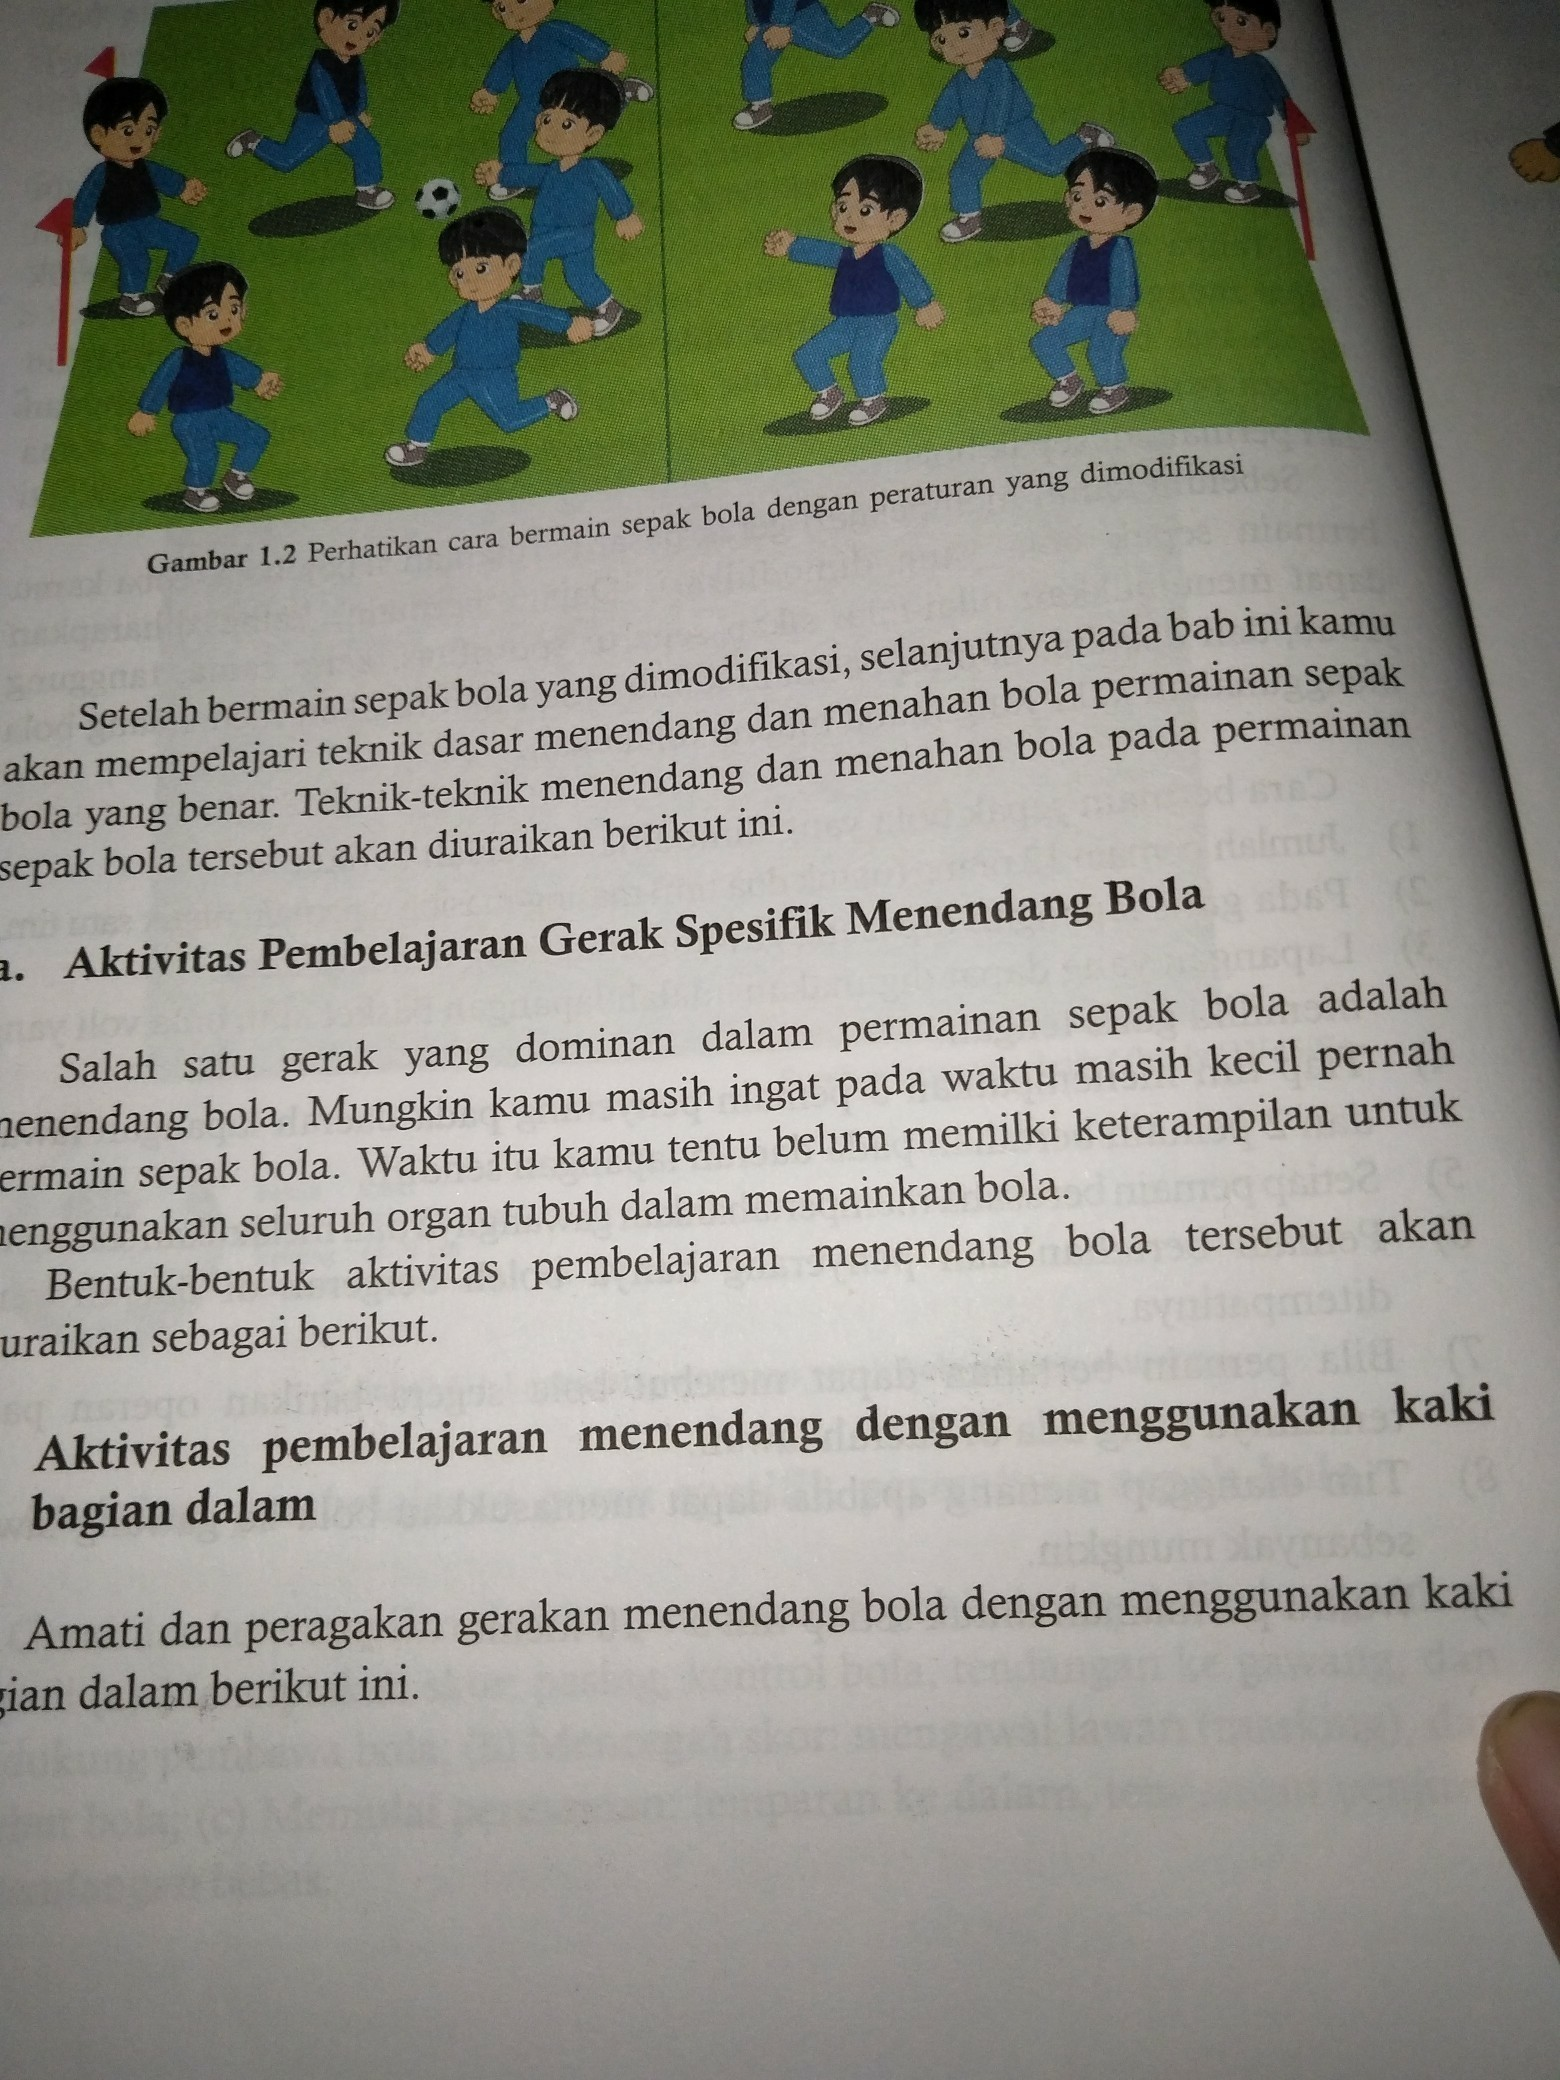 Jelaskan Maksud Dari Permainan Sepak Bola Dengan Peraturan Yang Dimodifikasi Ini Aturannya